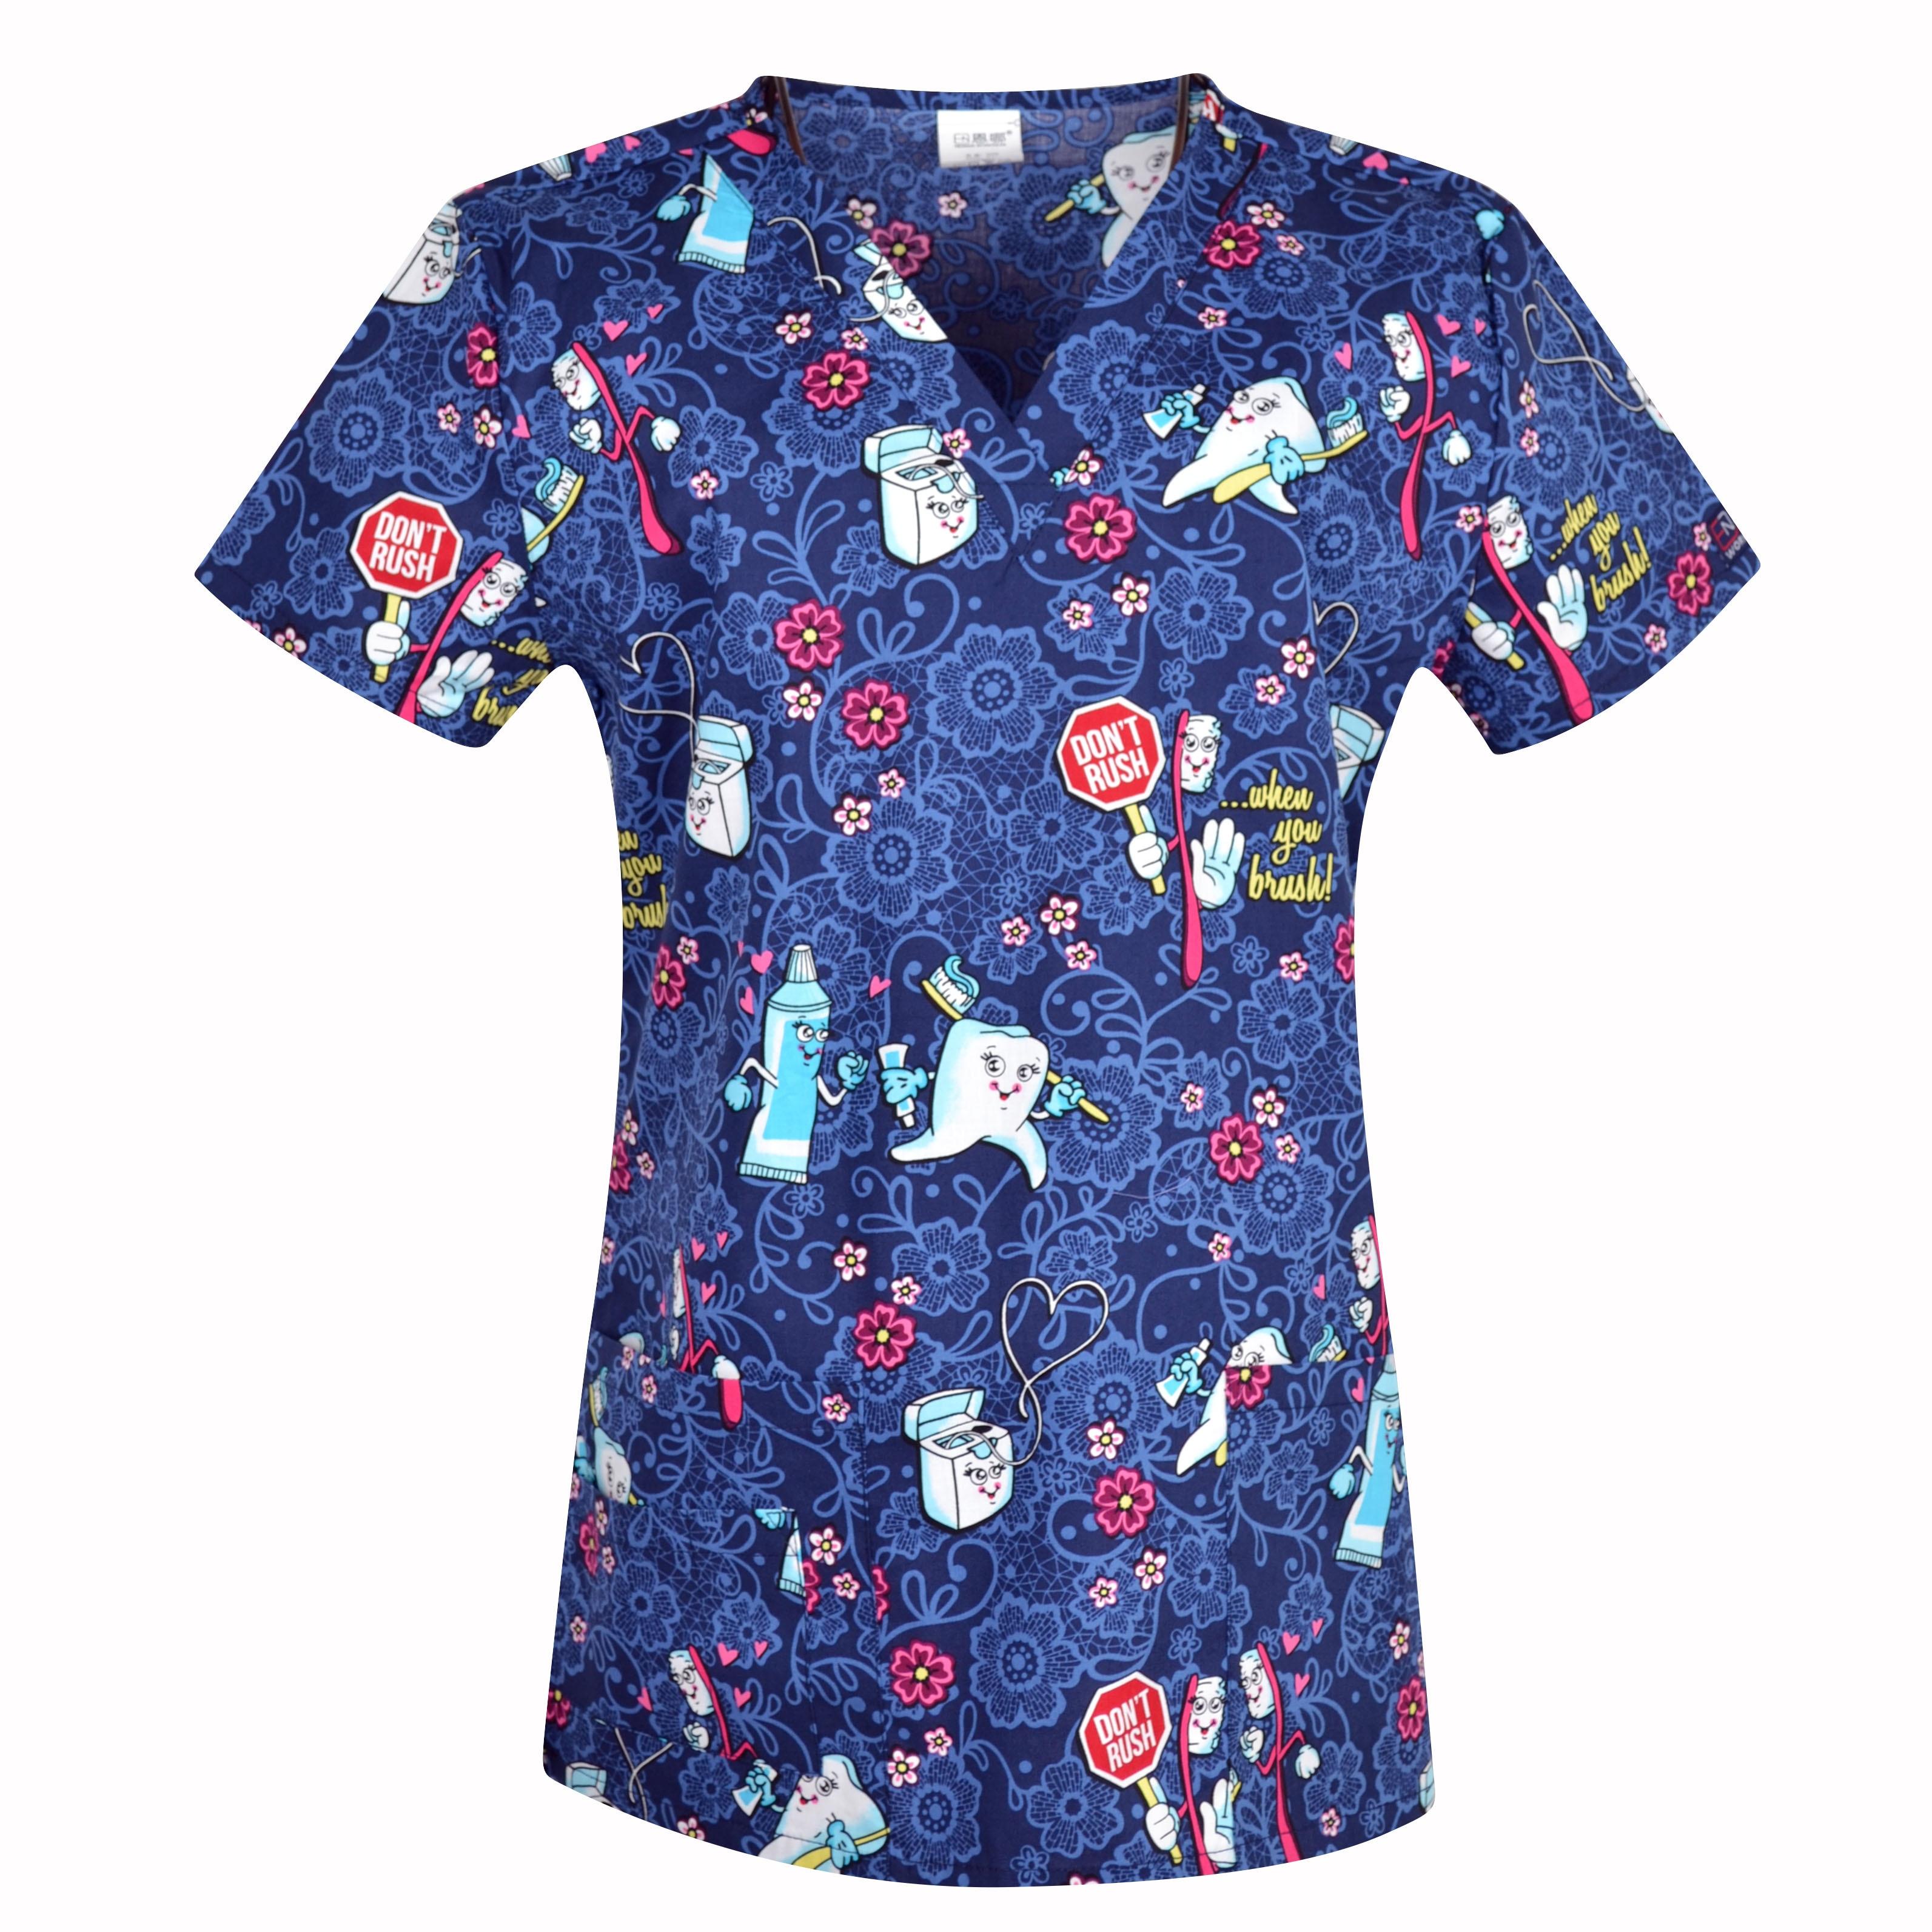 1910 NEW Hennar Women Scrub Top With V-Neck 100% Cotton Print Surgical Medical Uniforms Hospital Nurse Scrub Tops For Women